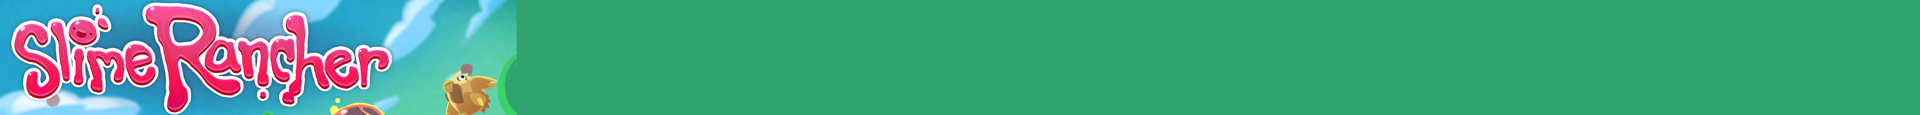 Slime Rancher Xbox Gameplay Slime Keys - Gamerheadquarters